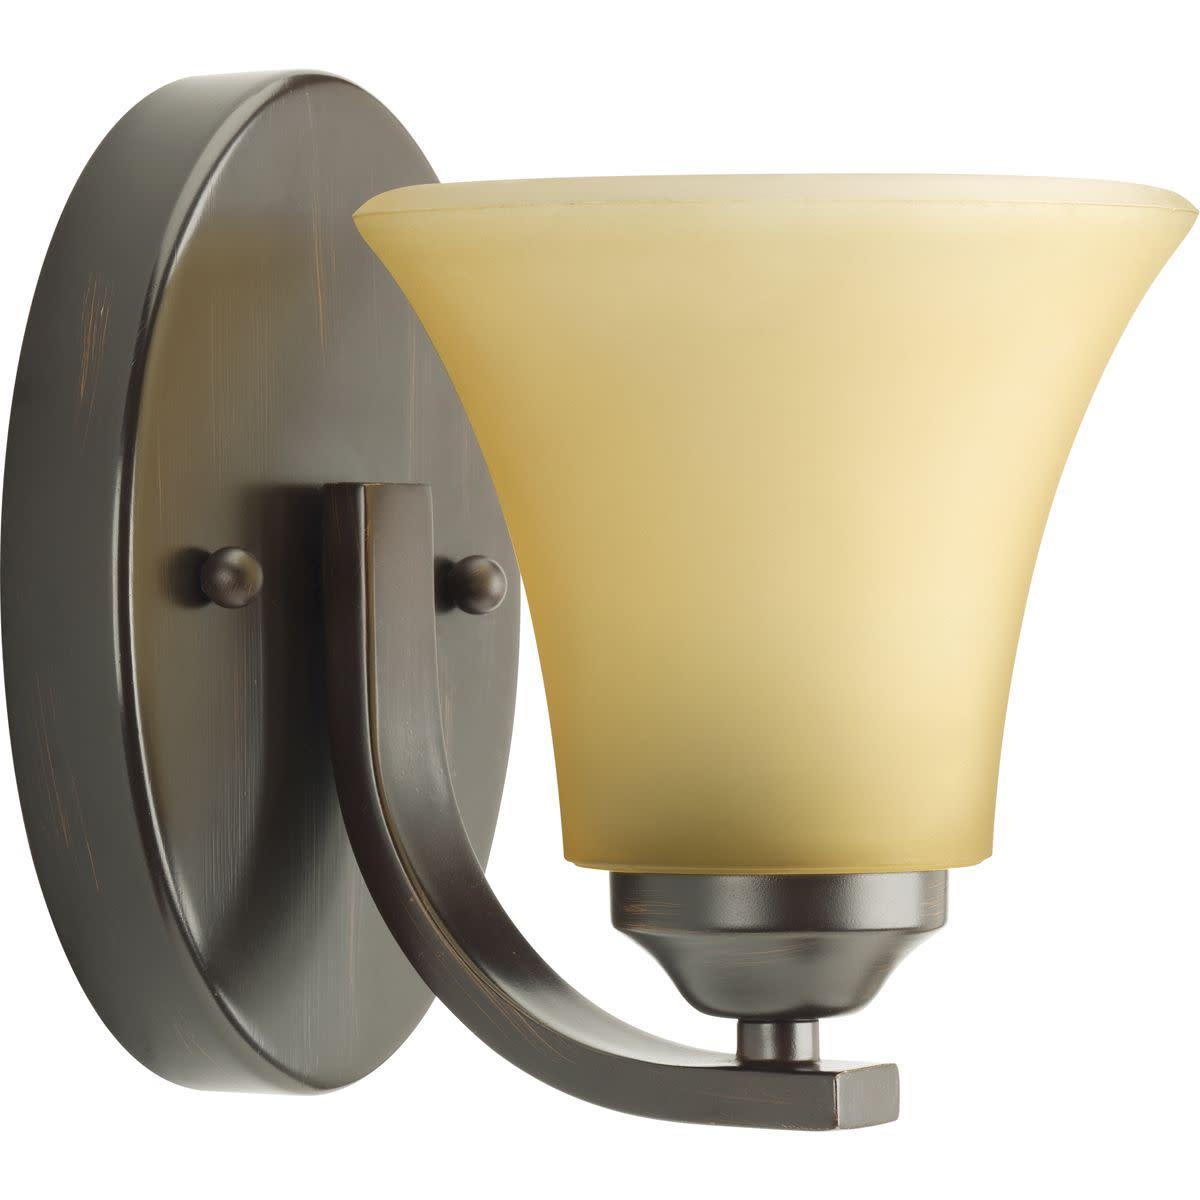 Progress Lighting 1-Light Pendant $9,  Bathroom Sconces From $9, Vanity Lights from $18 & More at Walmart + FS on $35+